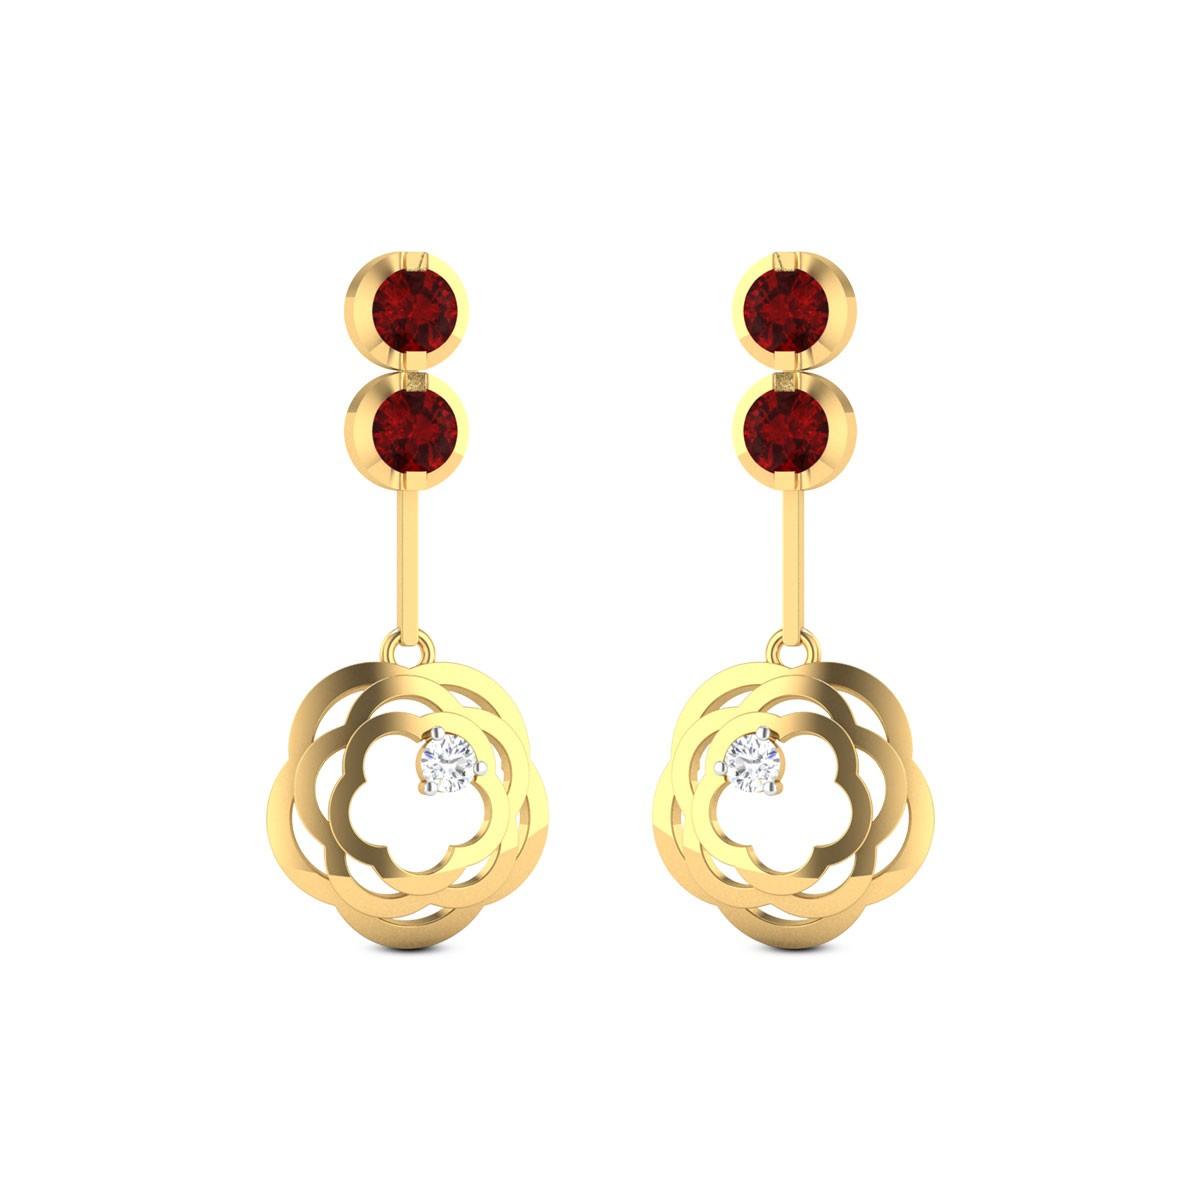 Fuxina Drop Earrings